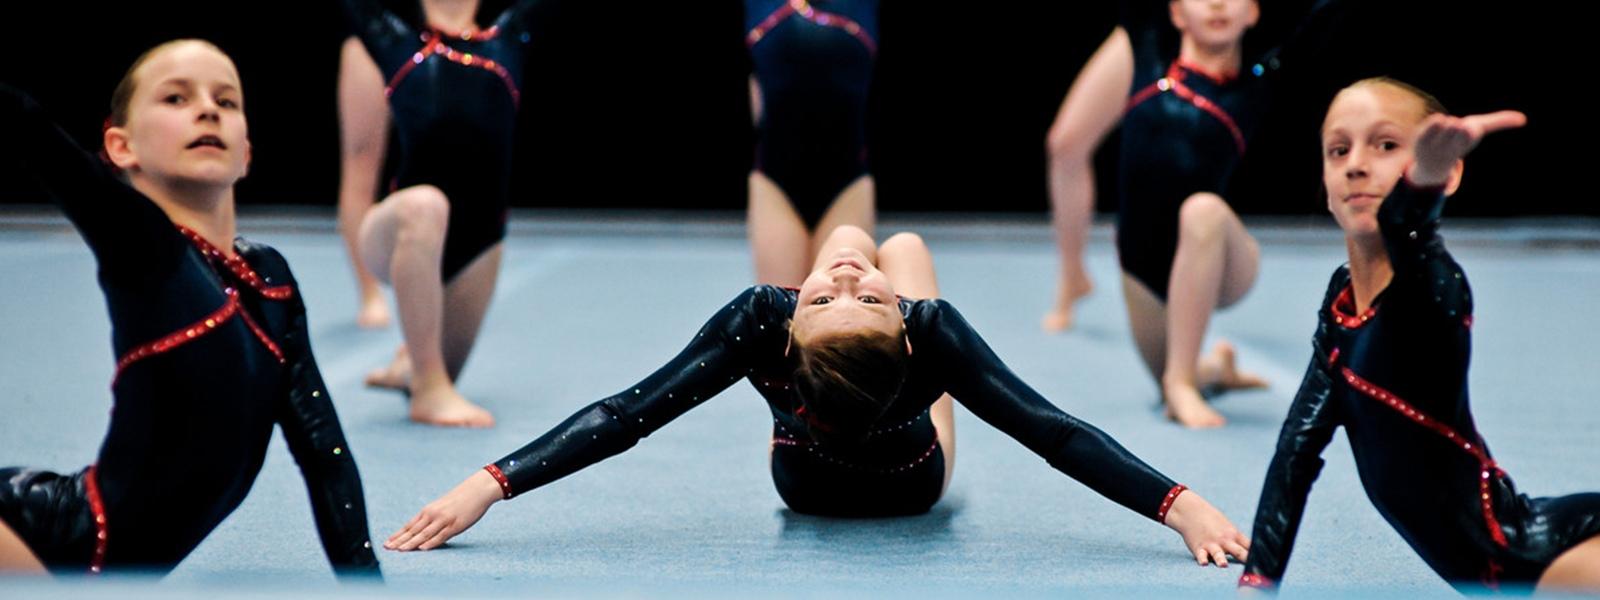 Командная гимнастика (6+)